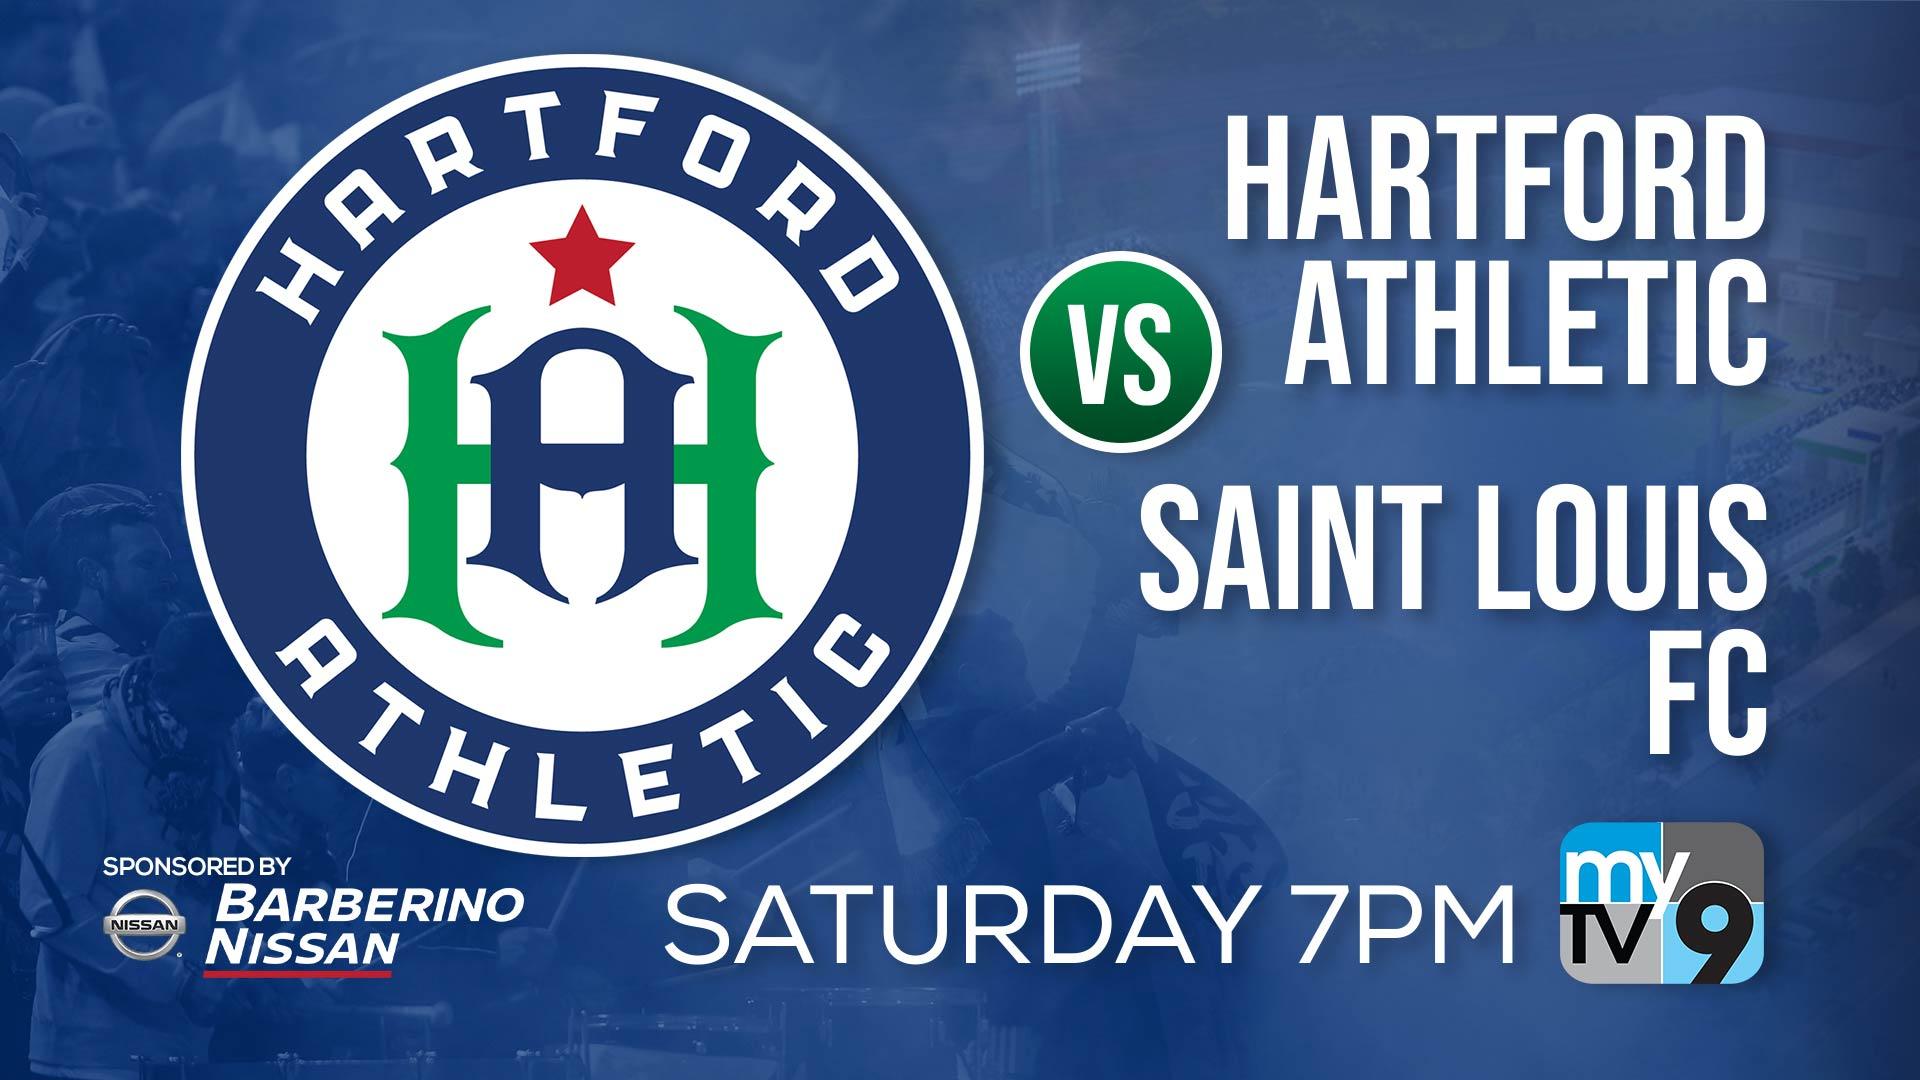 Hartford-Athletic-Promo_06-08-SAT_1559672319340.jpg